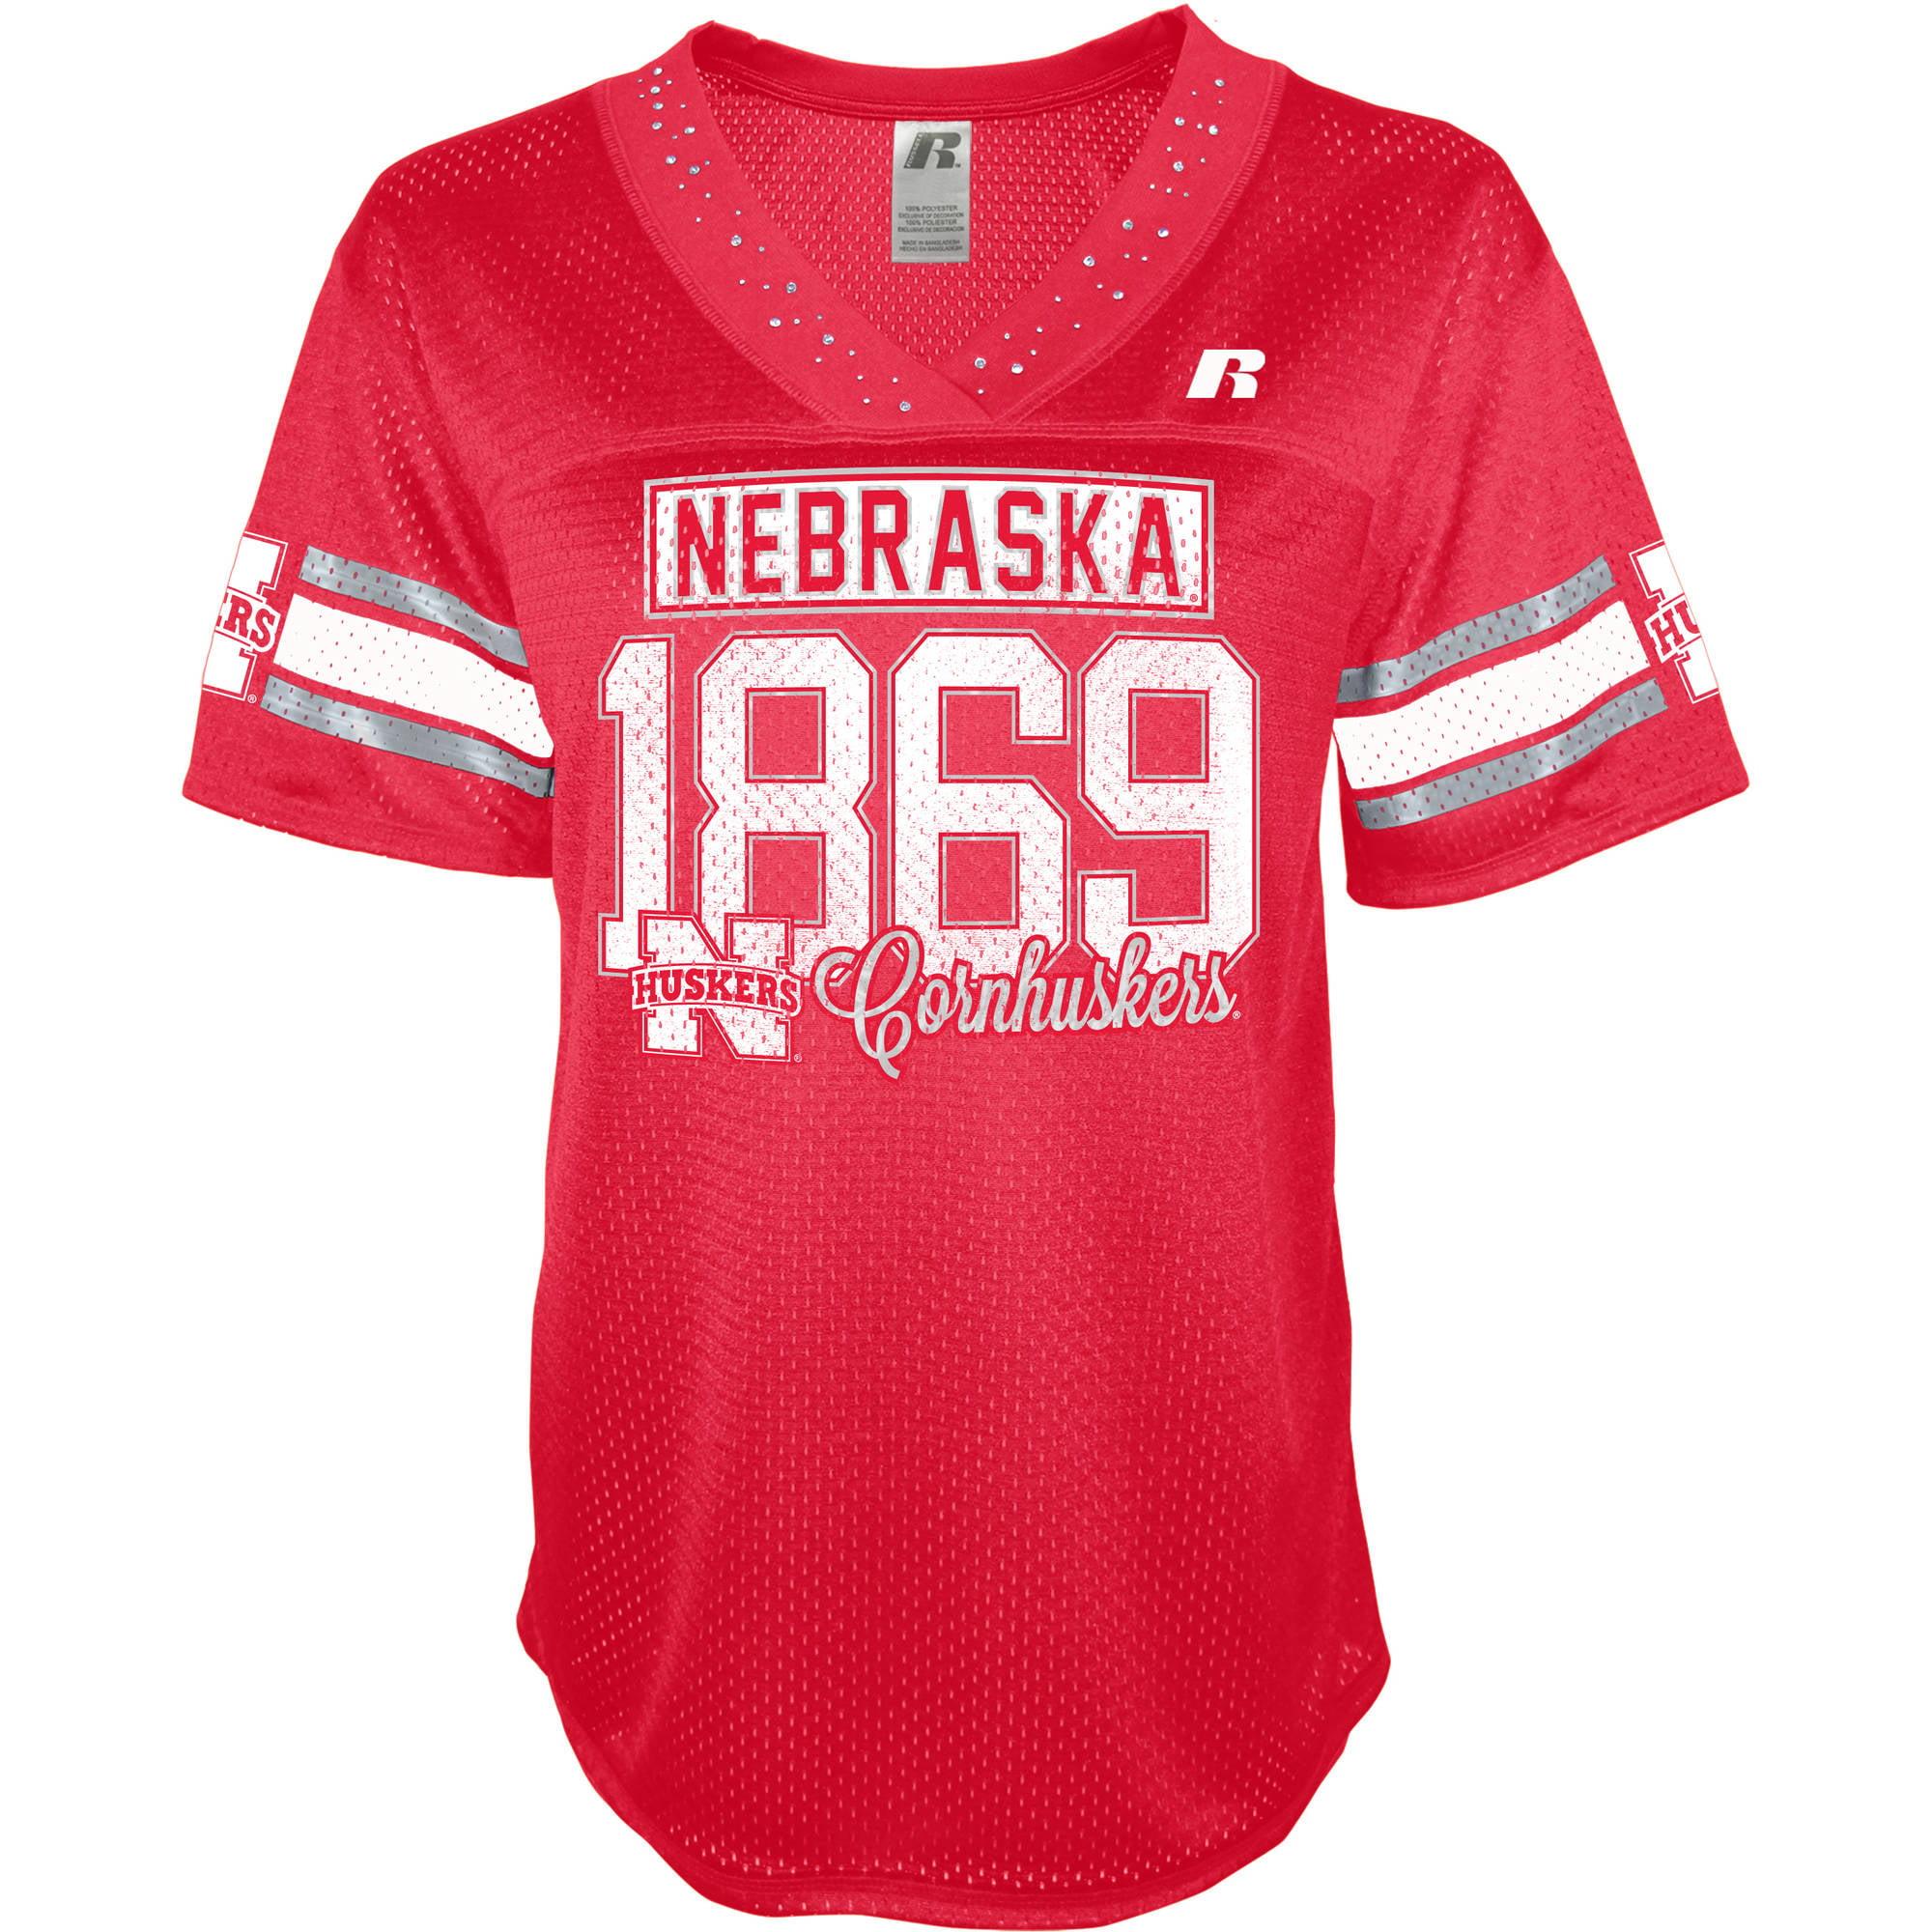 NCAA Football Jersey